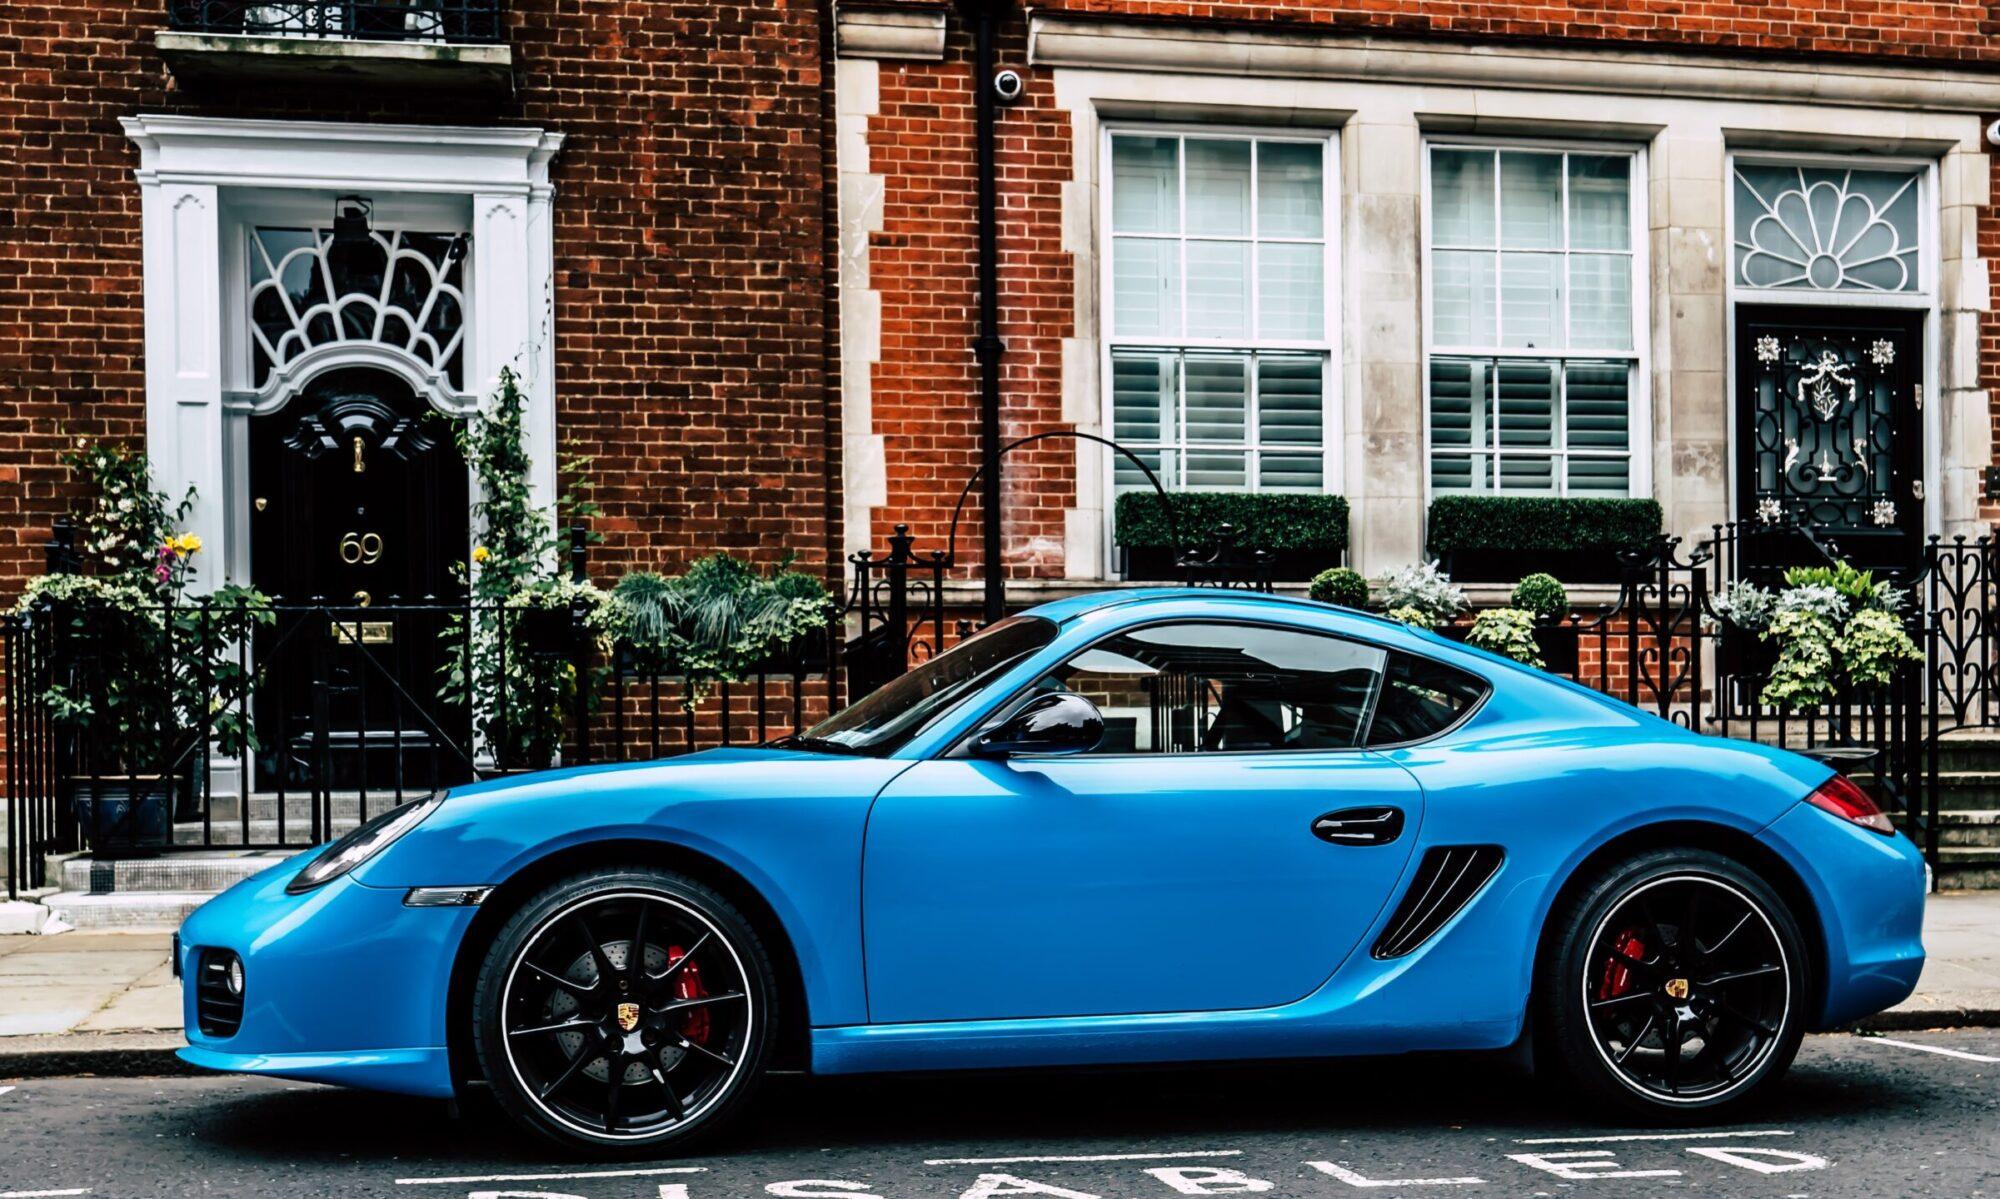 Porsche Valuations